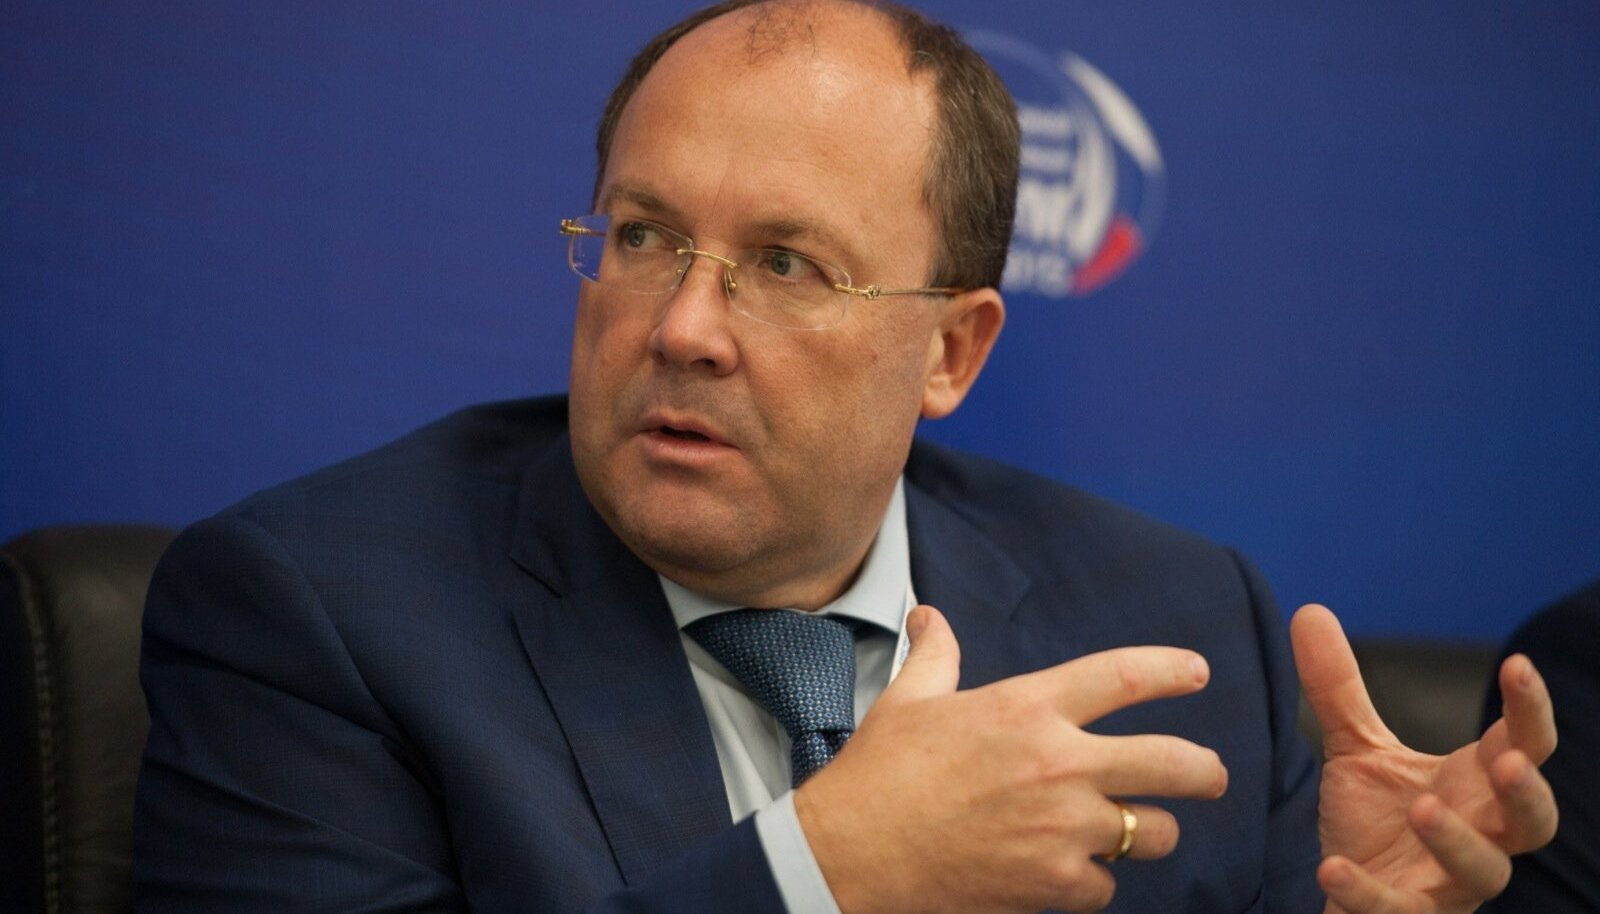 Oleg Safonov